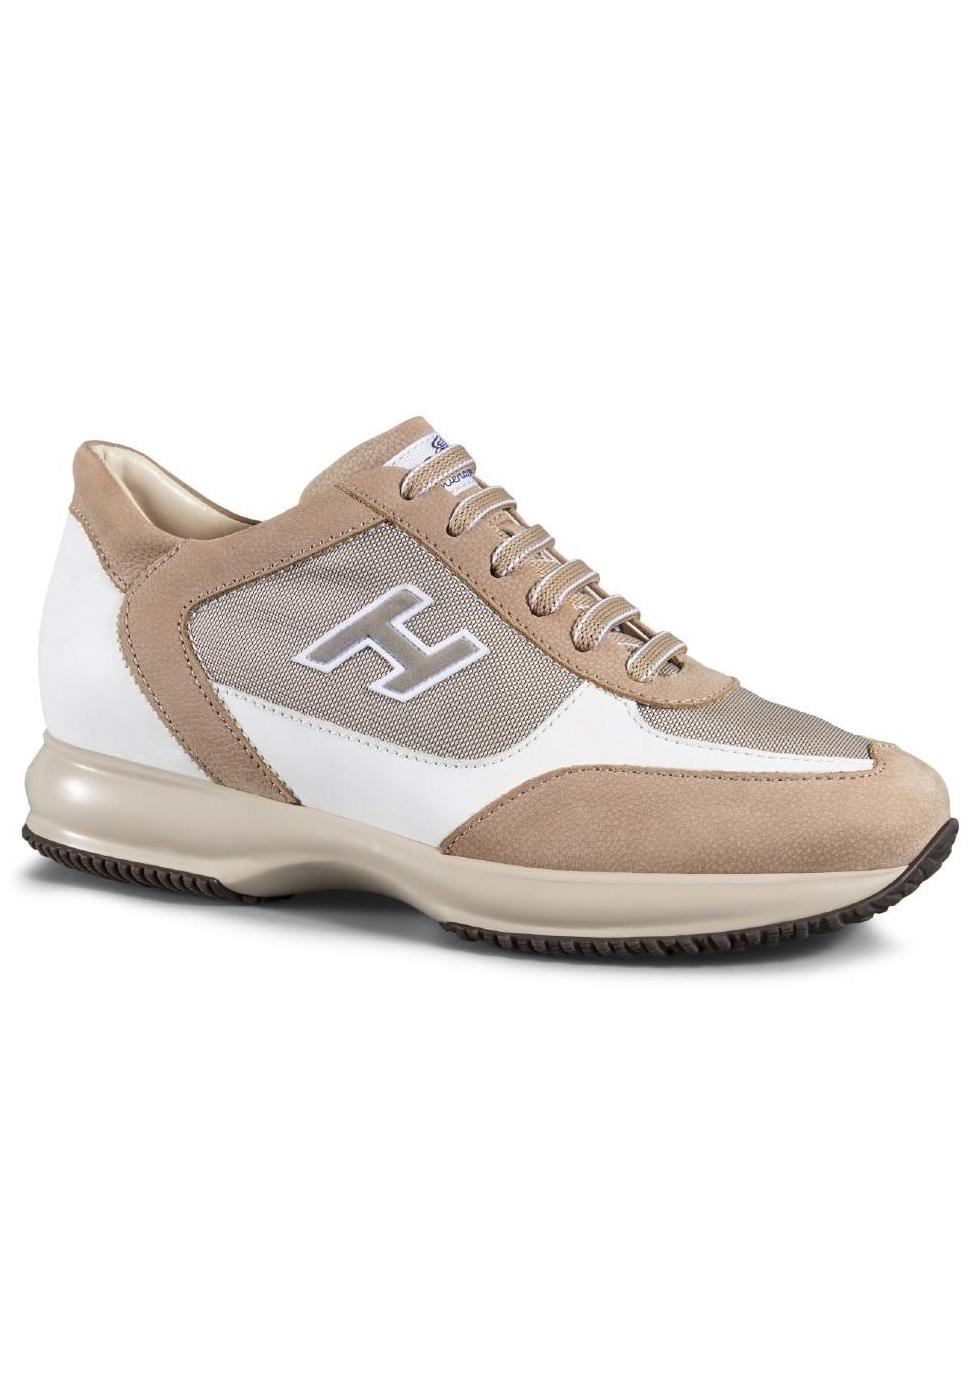 Sneakers Hogan Interactive uomo in nabuk e pelle - Italian Boutique c274244e232